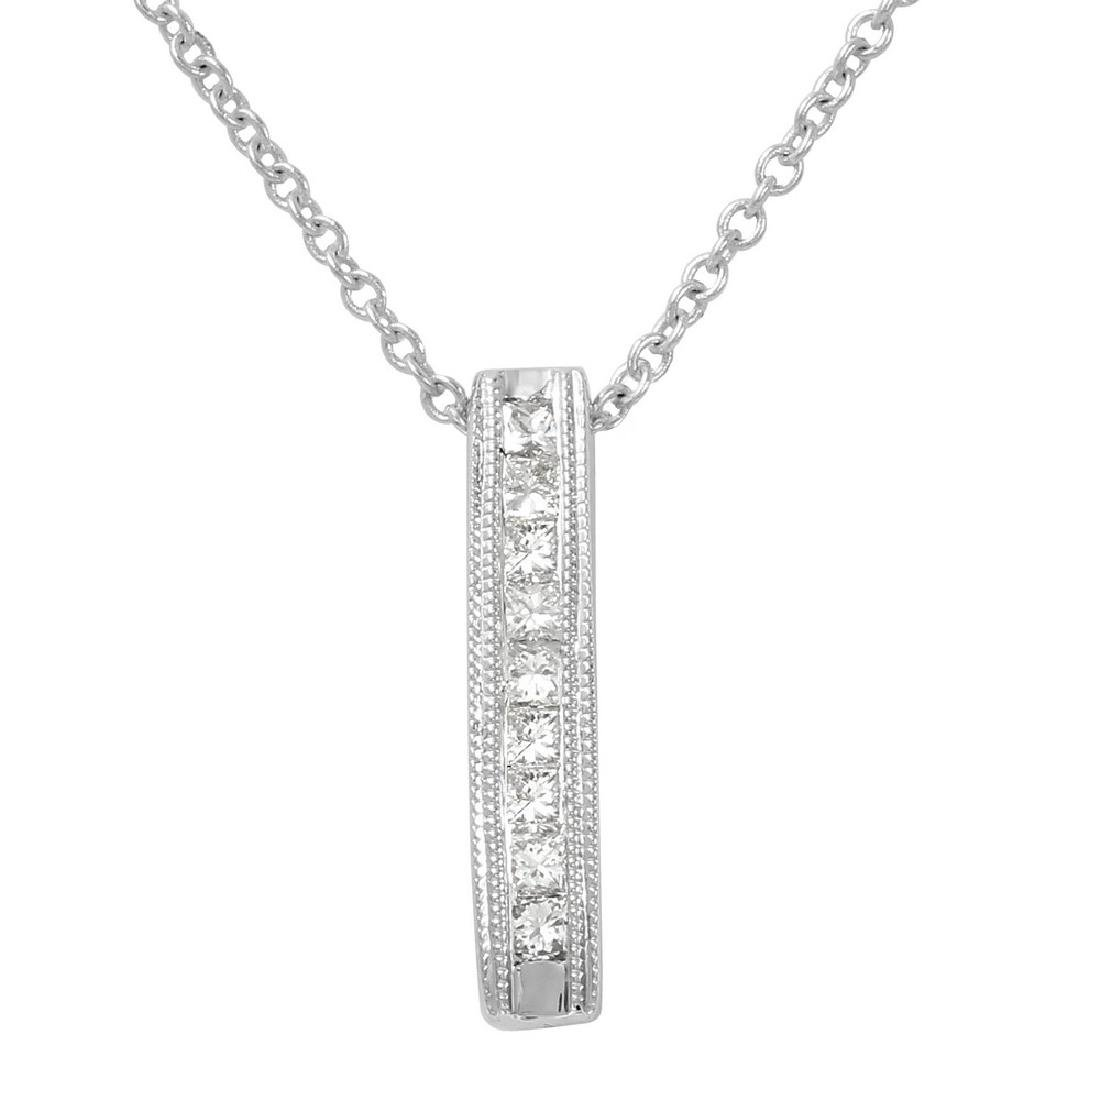 Genuine 0.15 TCW 14K White Gold Ladies Necklace